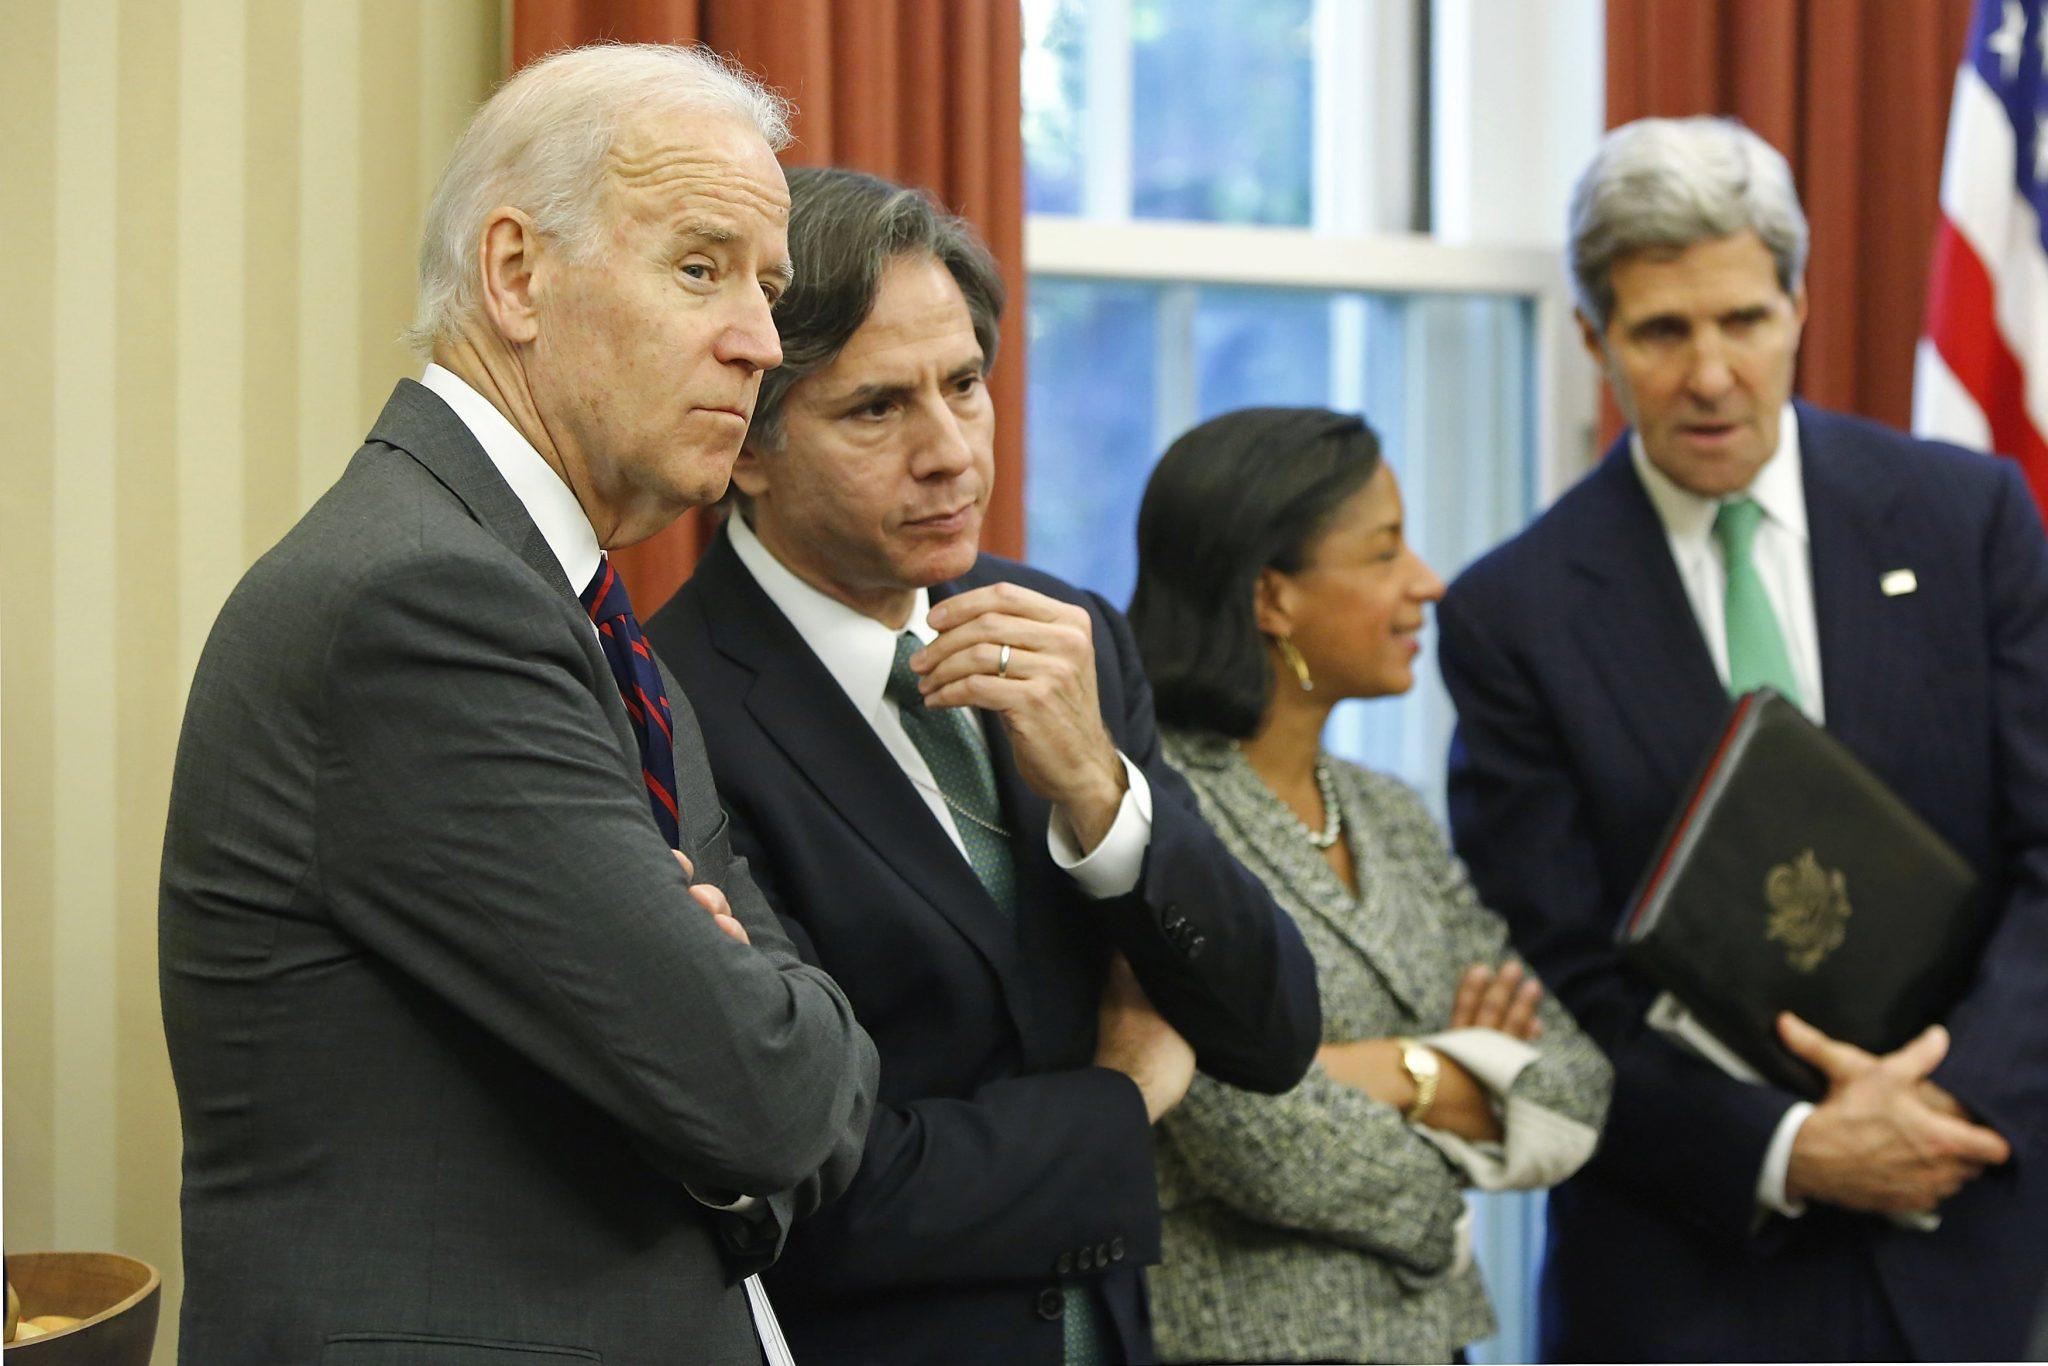 Biden brings new momentum to global climate change agenda